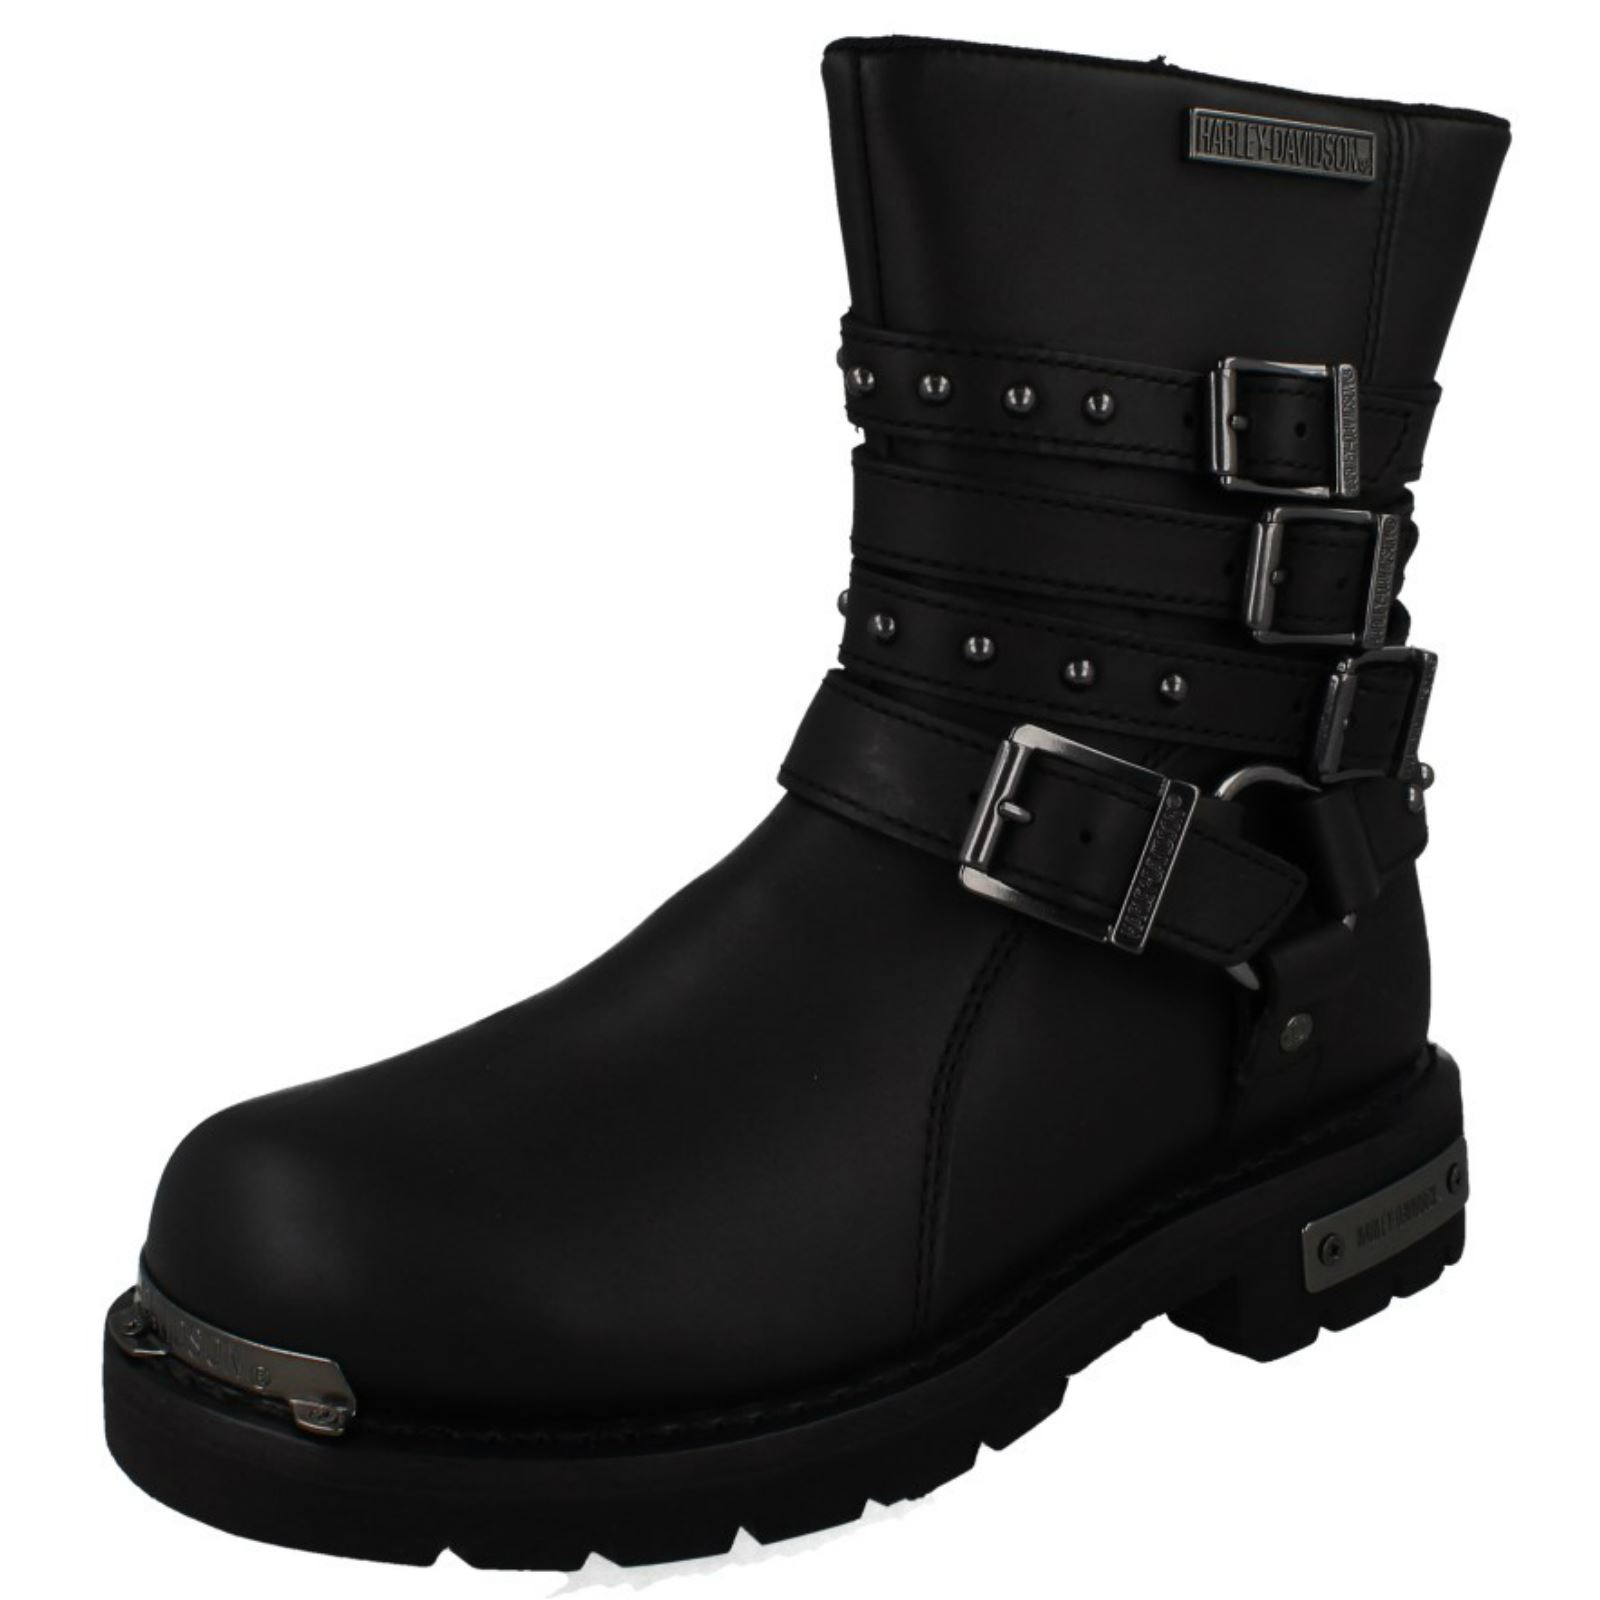 R99 Harley Davidson Baisley Ladies Black Biker Boots wide Fitting